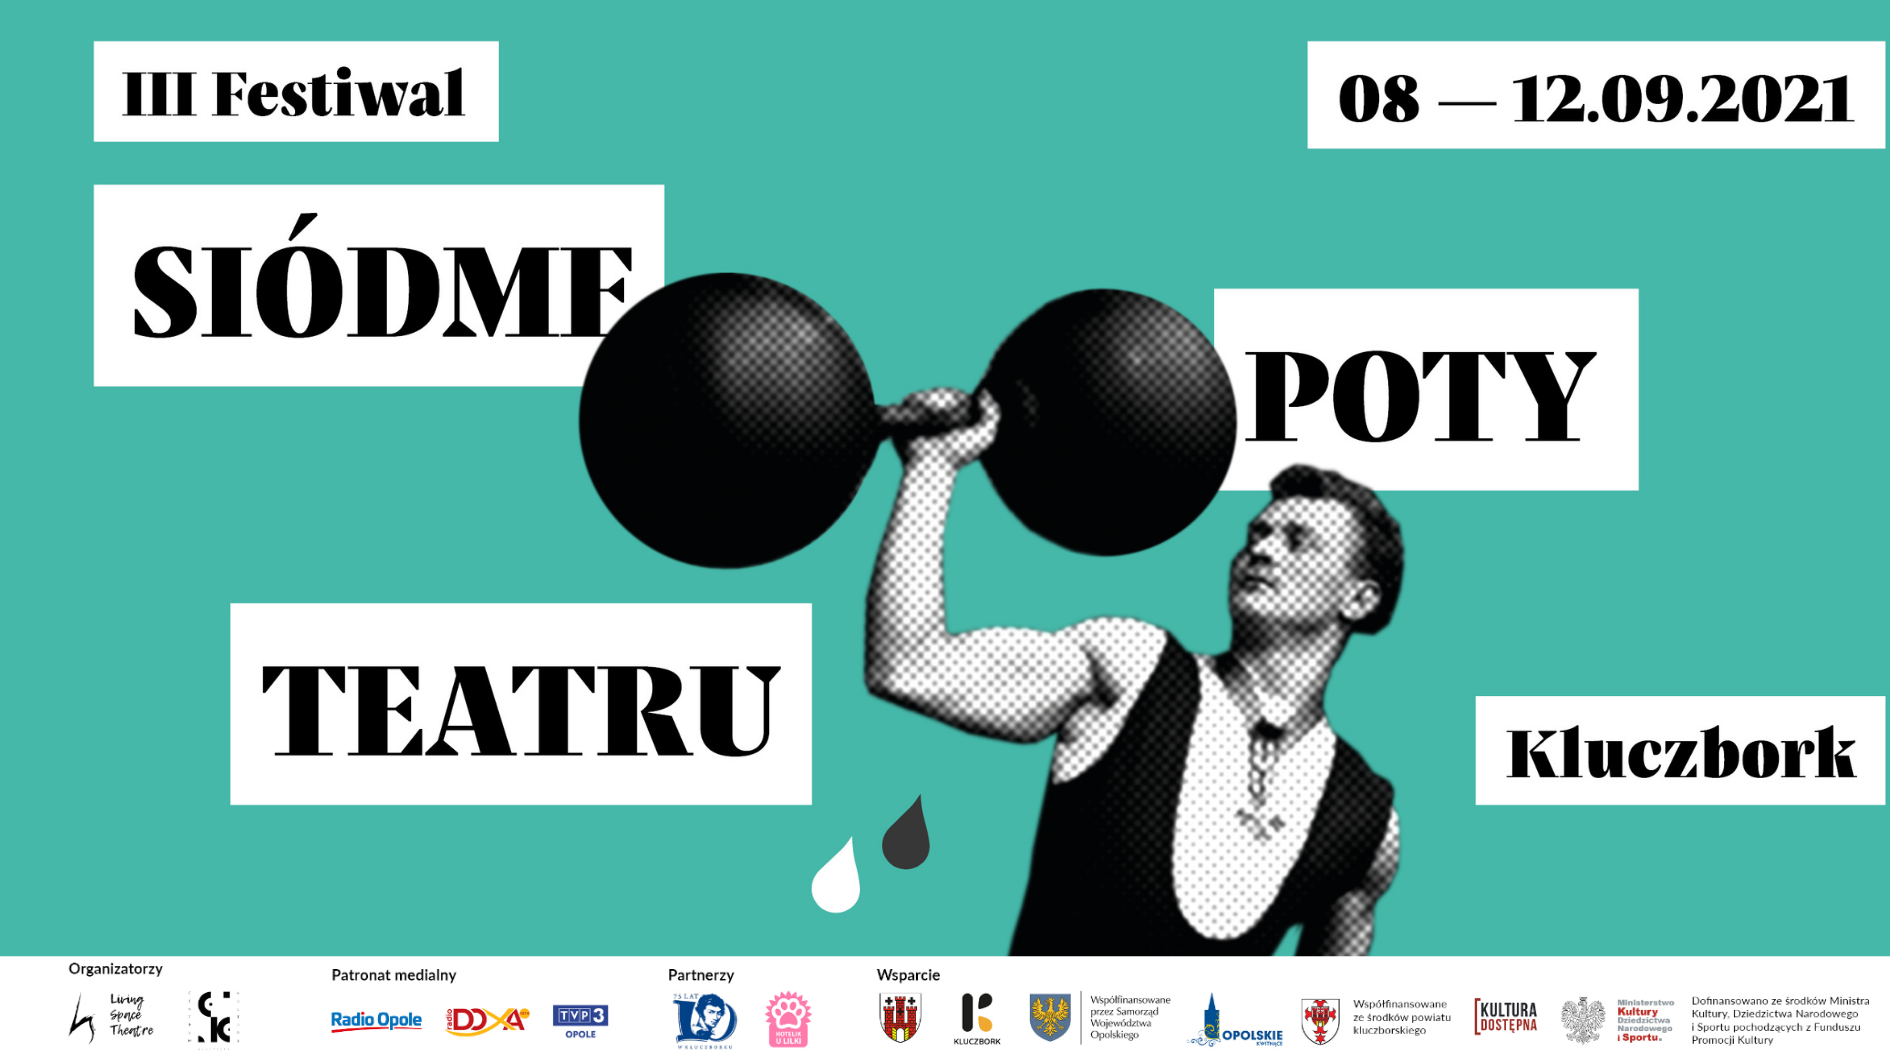 Plakat. III Festiwal Siódme Poty Teatru1